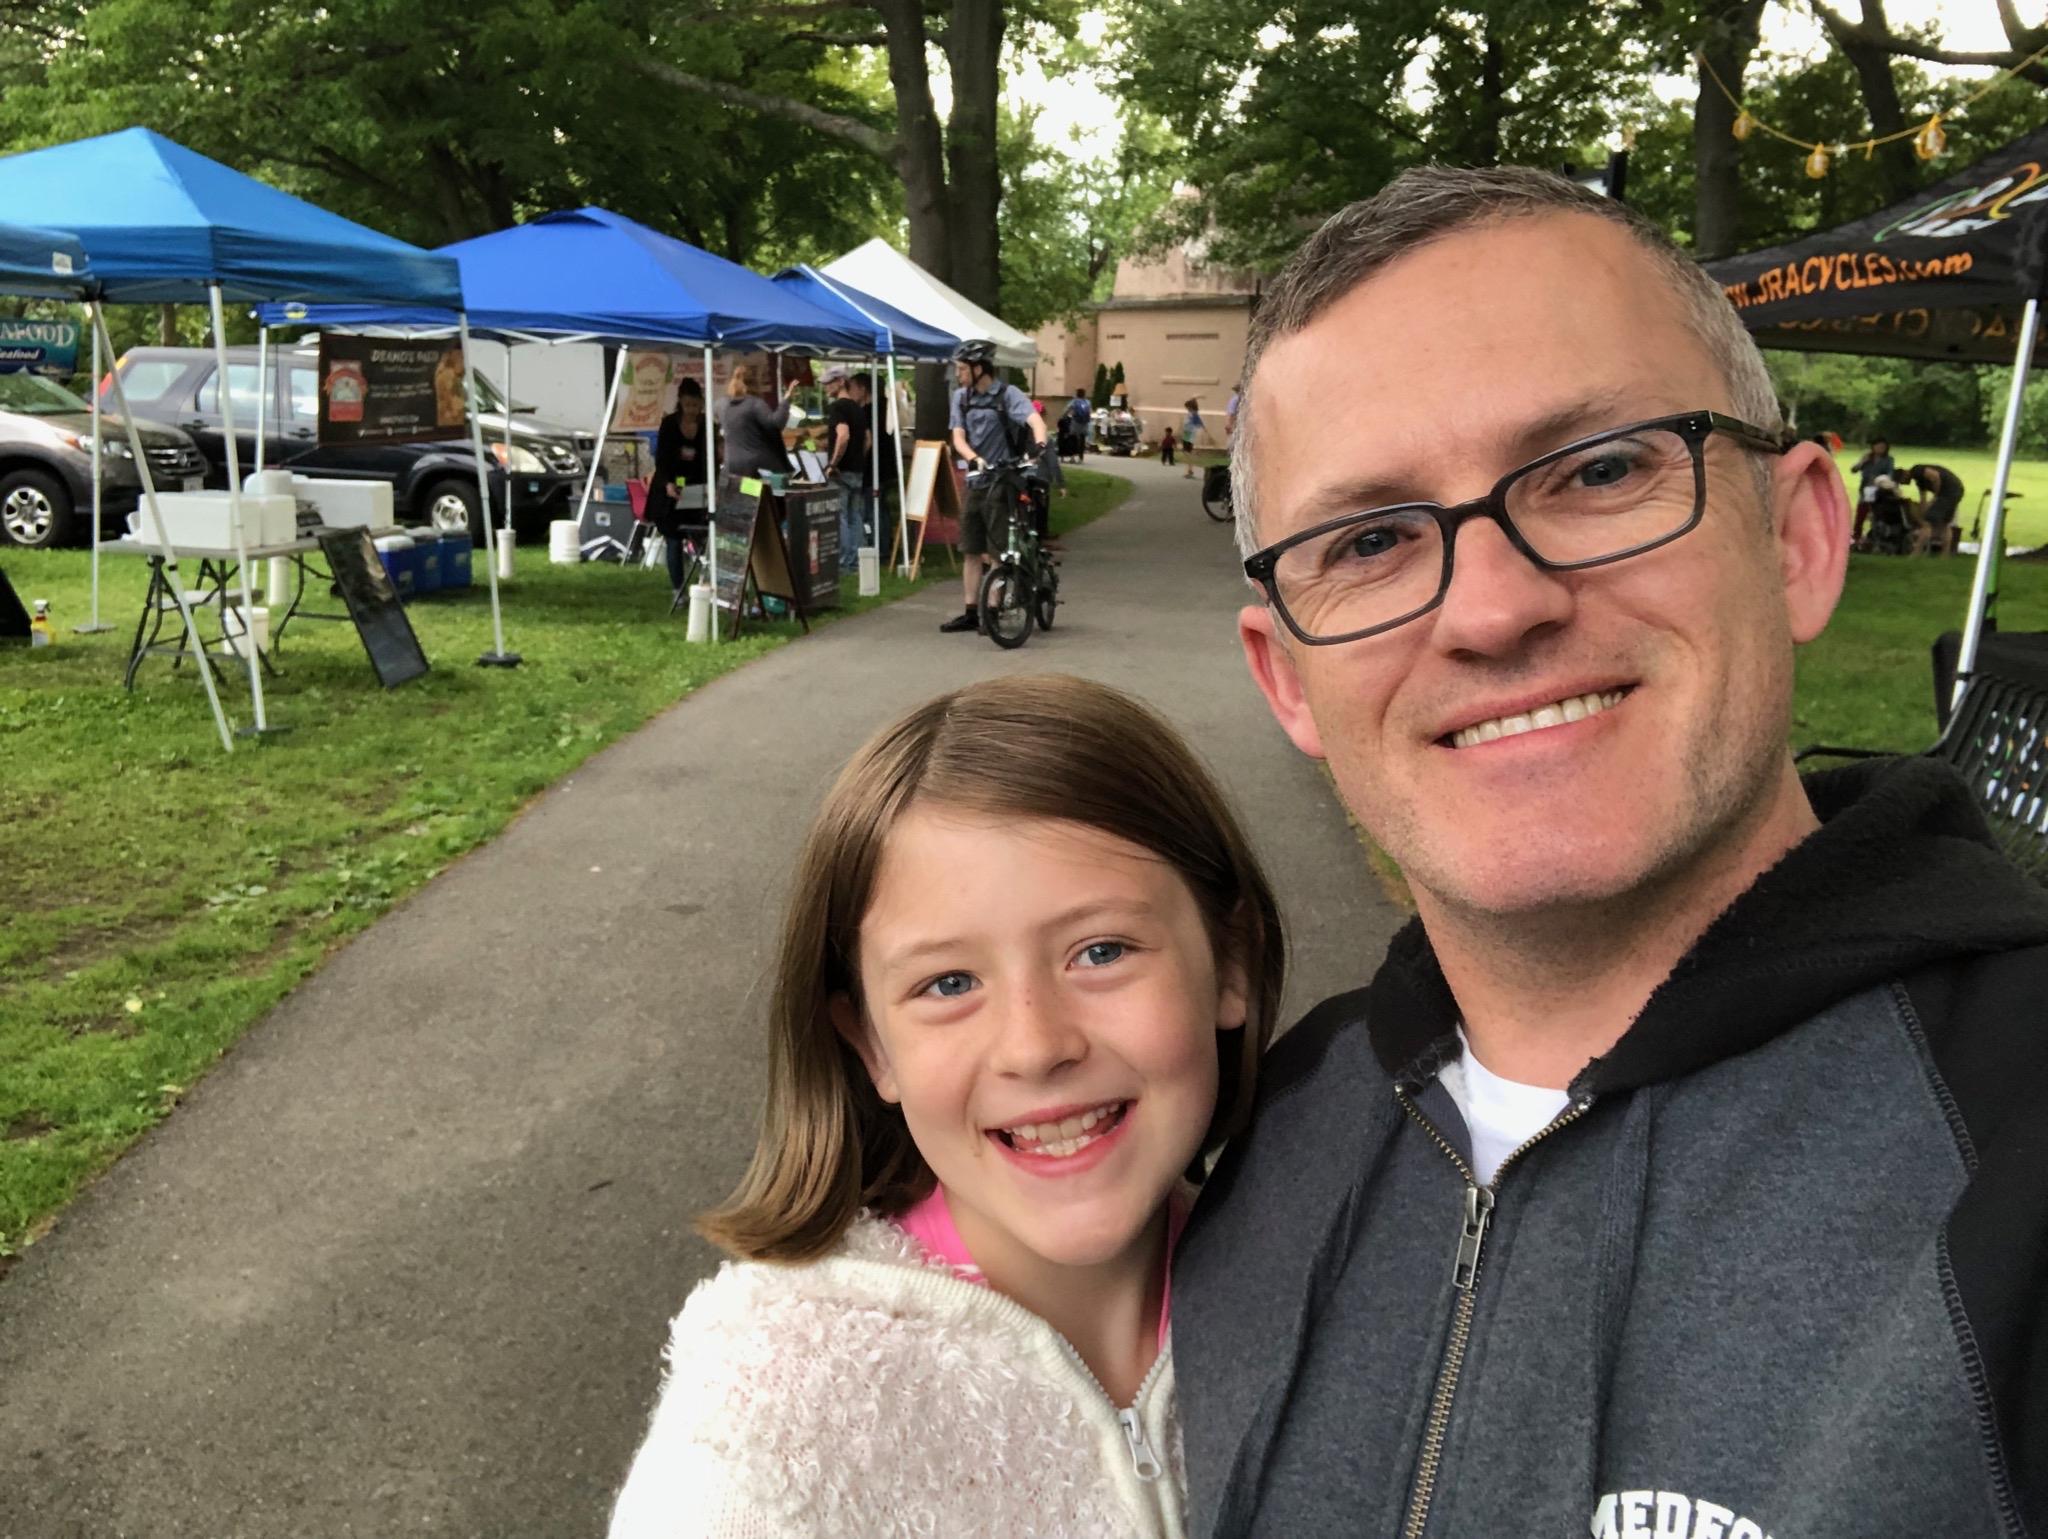 Medford Diversity Day 2018